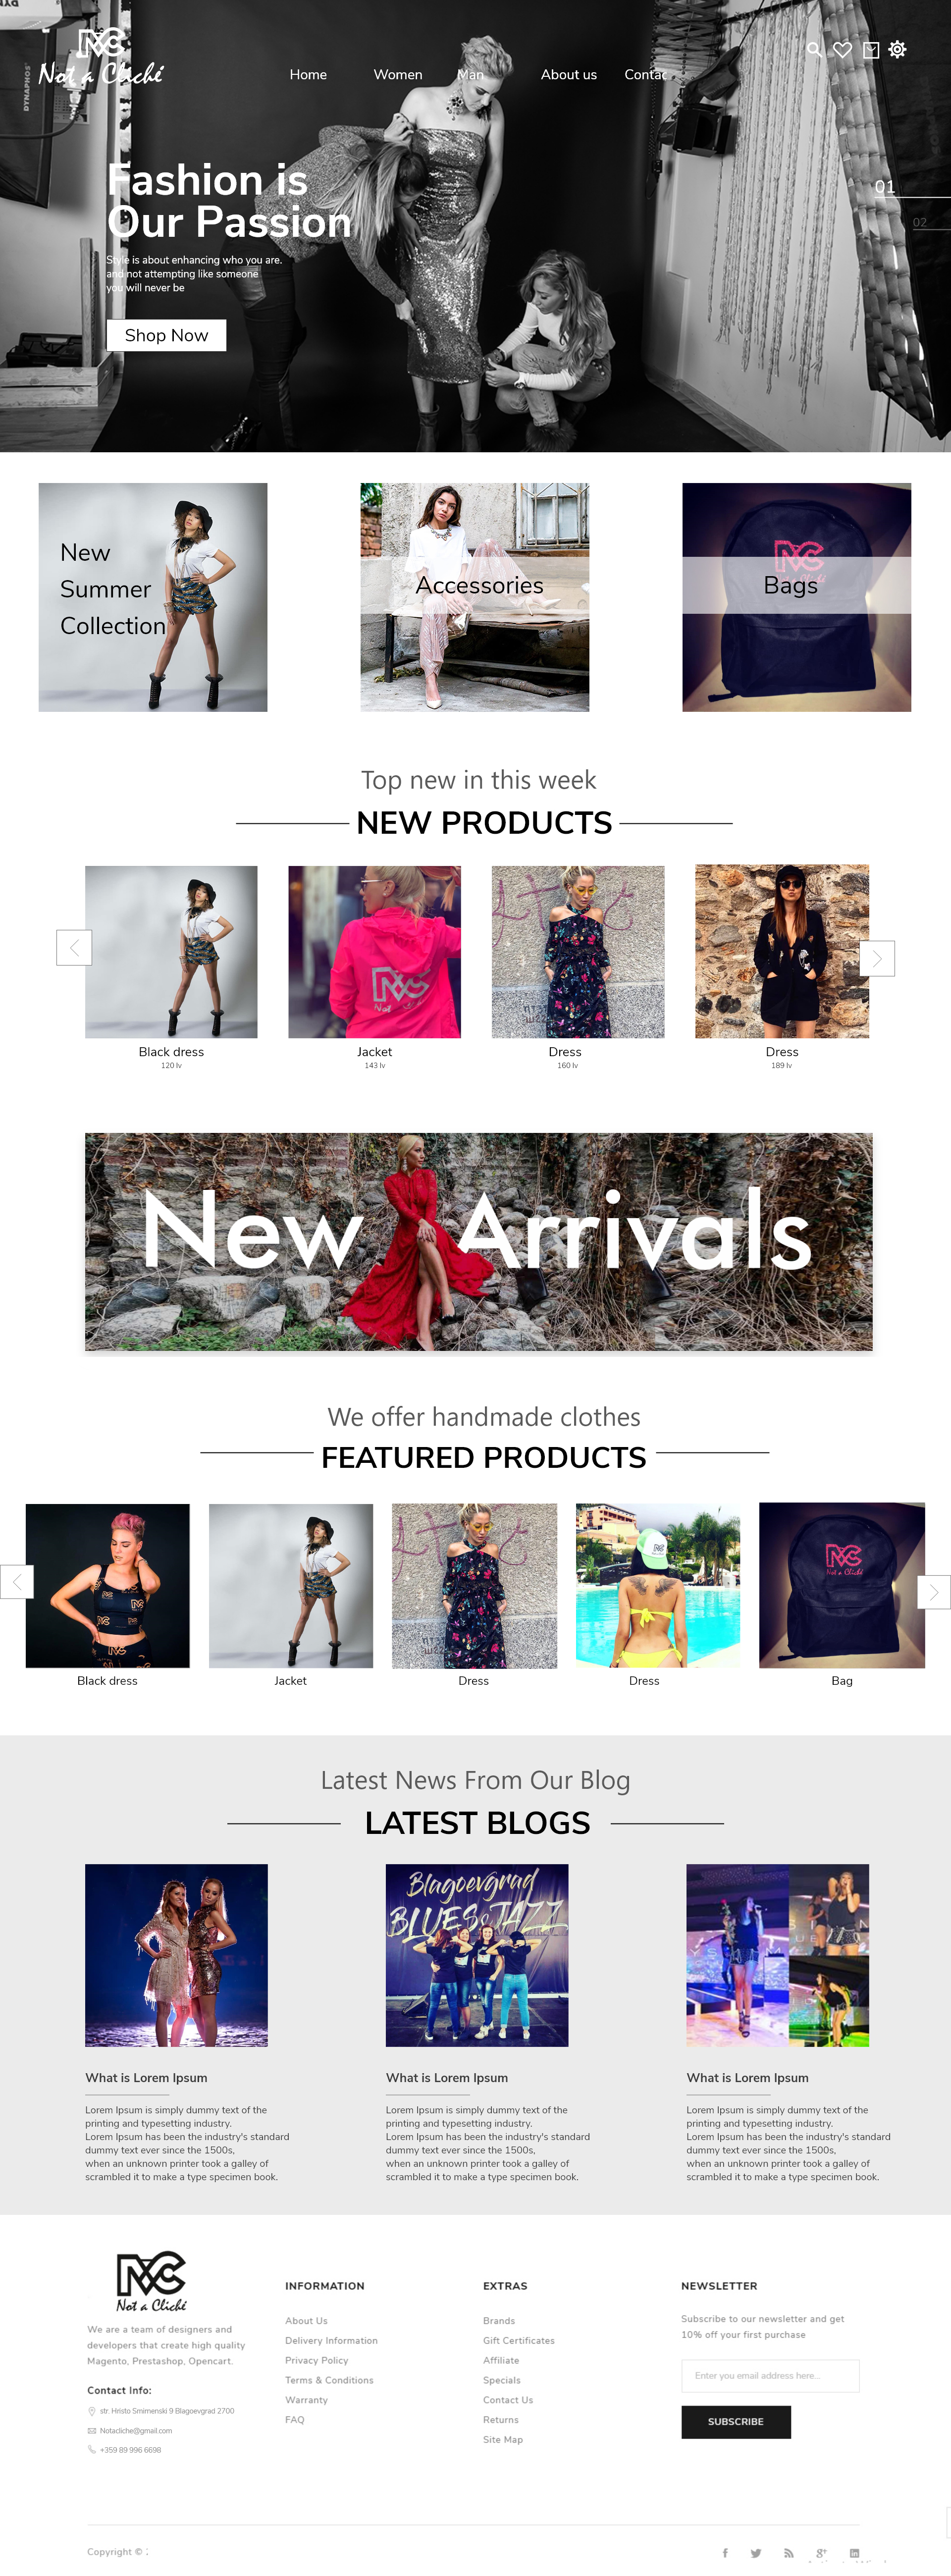 Online shop ecommerce fashion brand